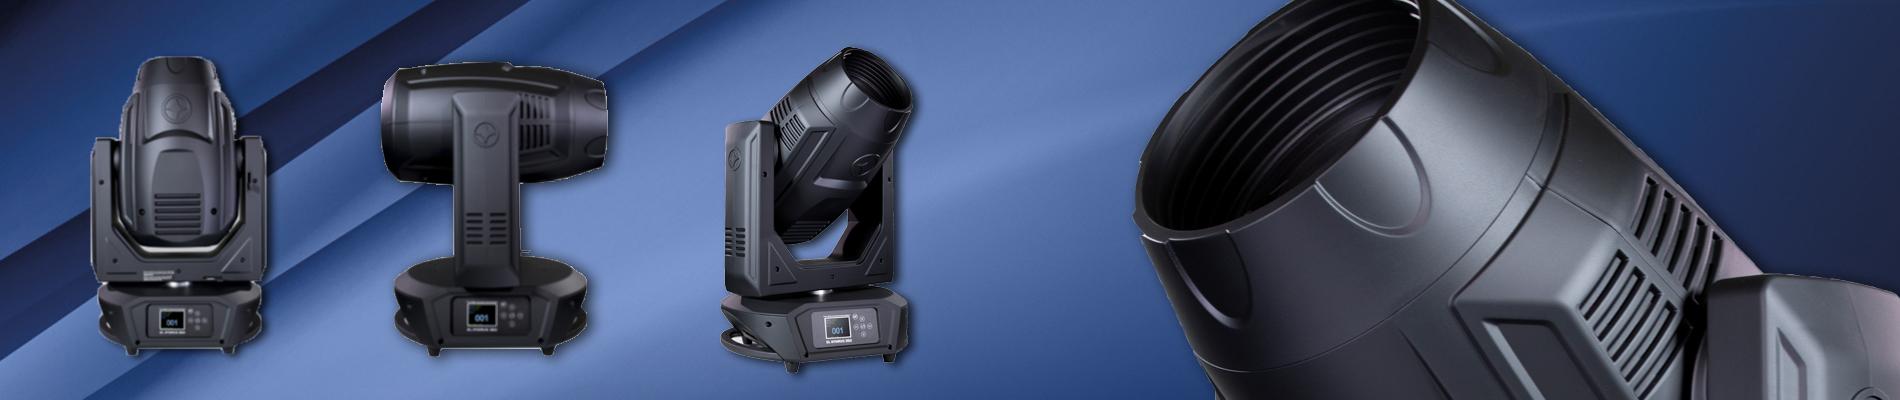 Hybrid Movinglight